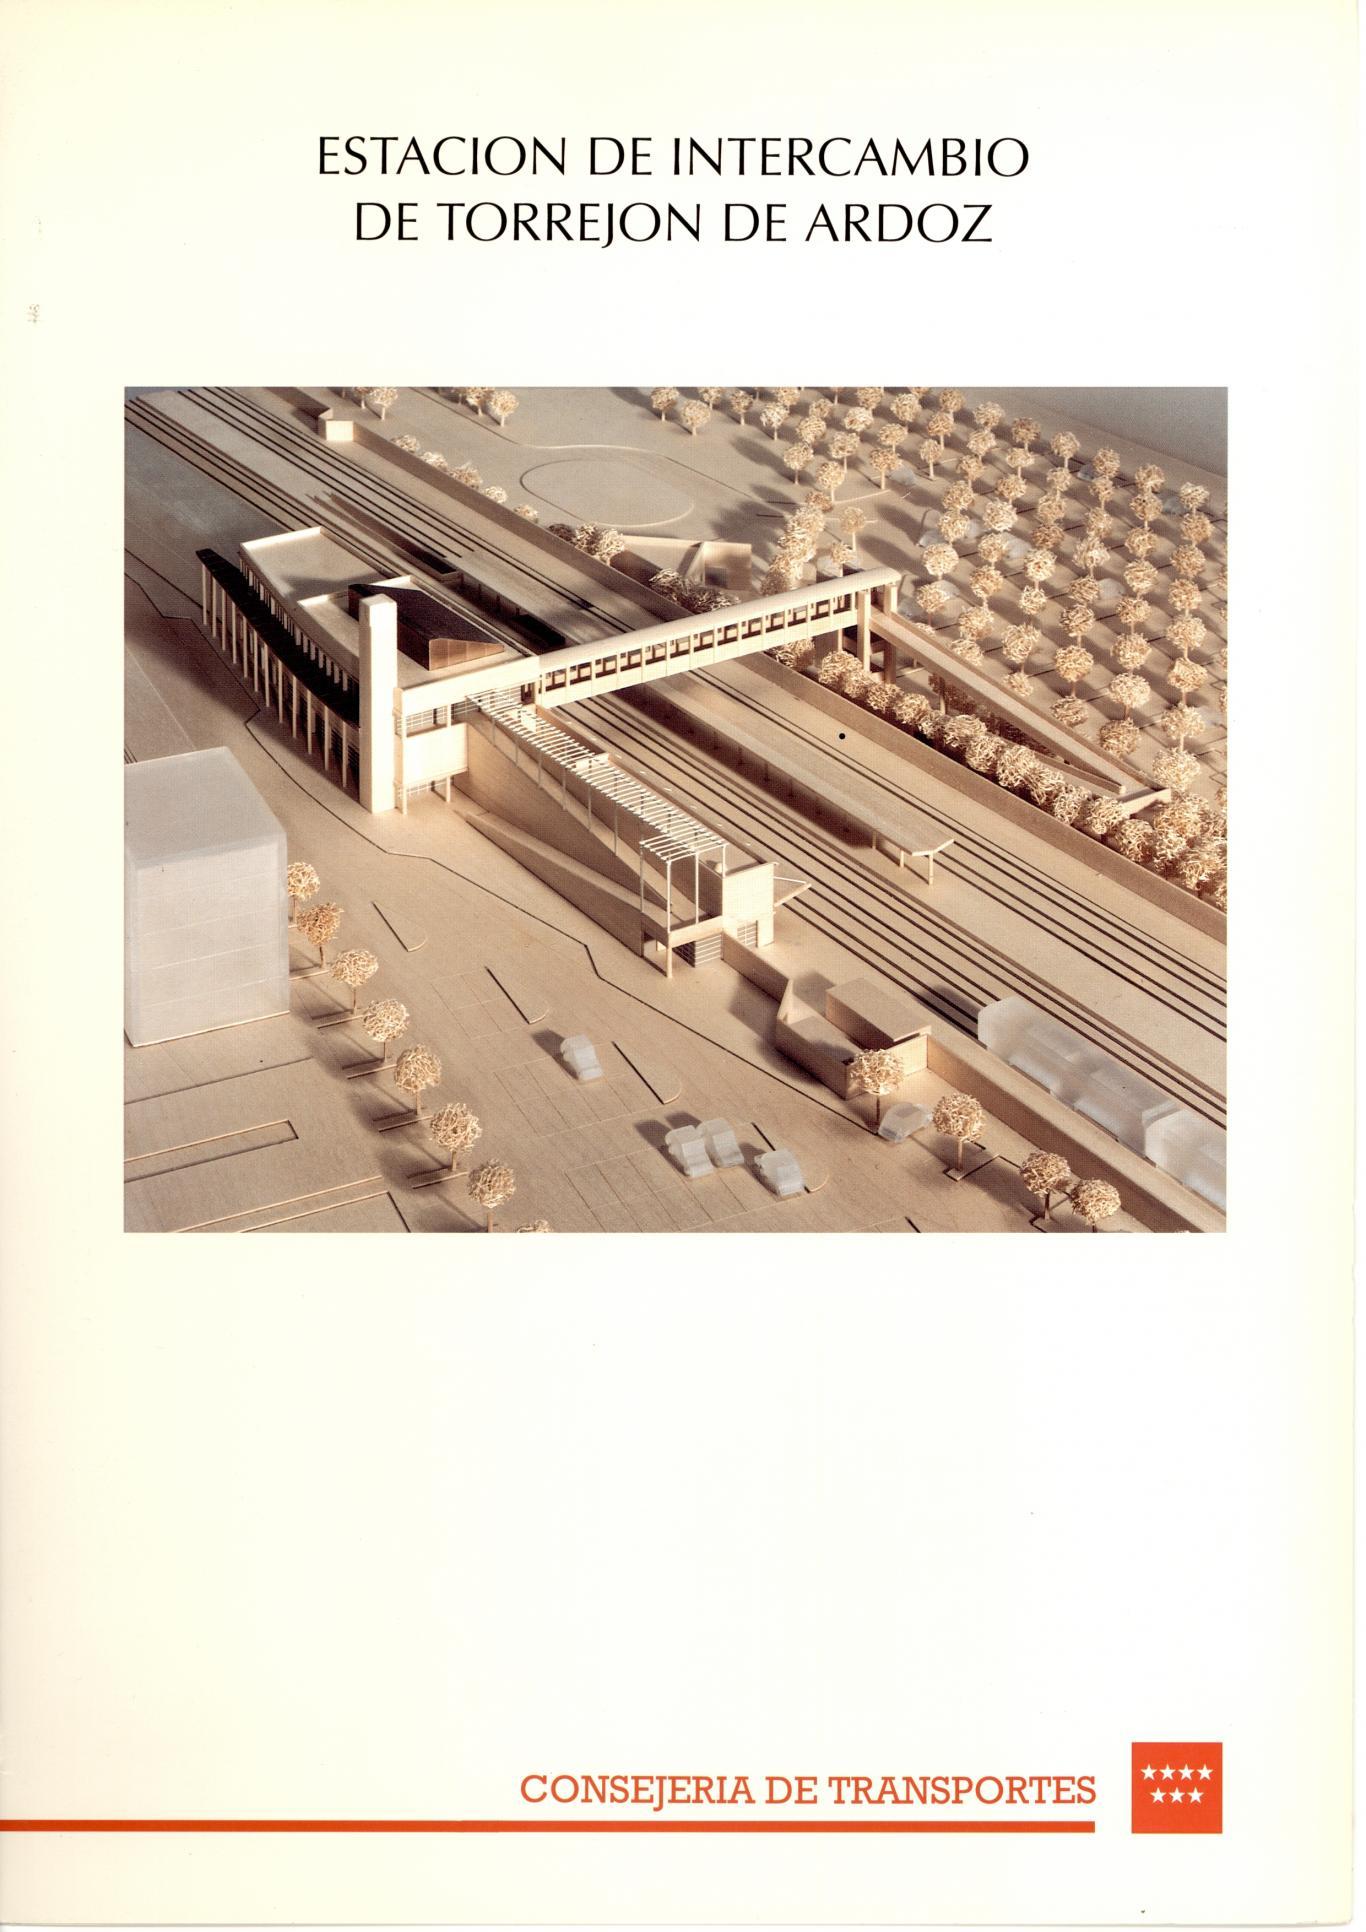 caratula folleto estacion intercambio Torrejon Ardoz